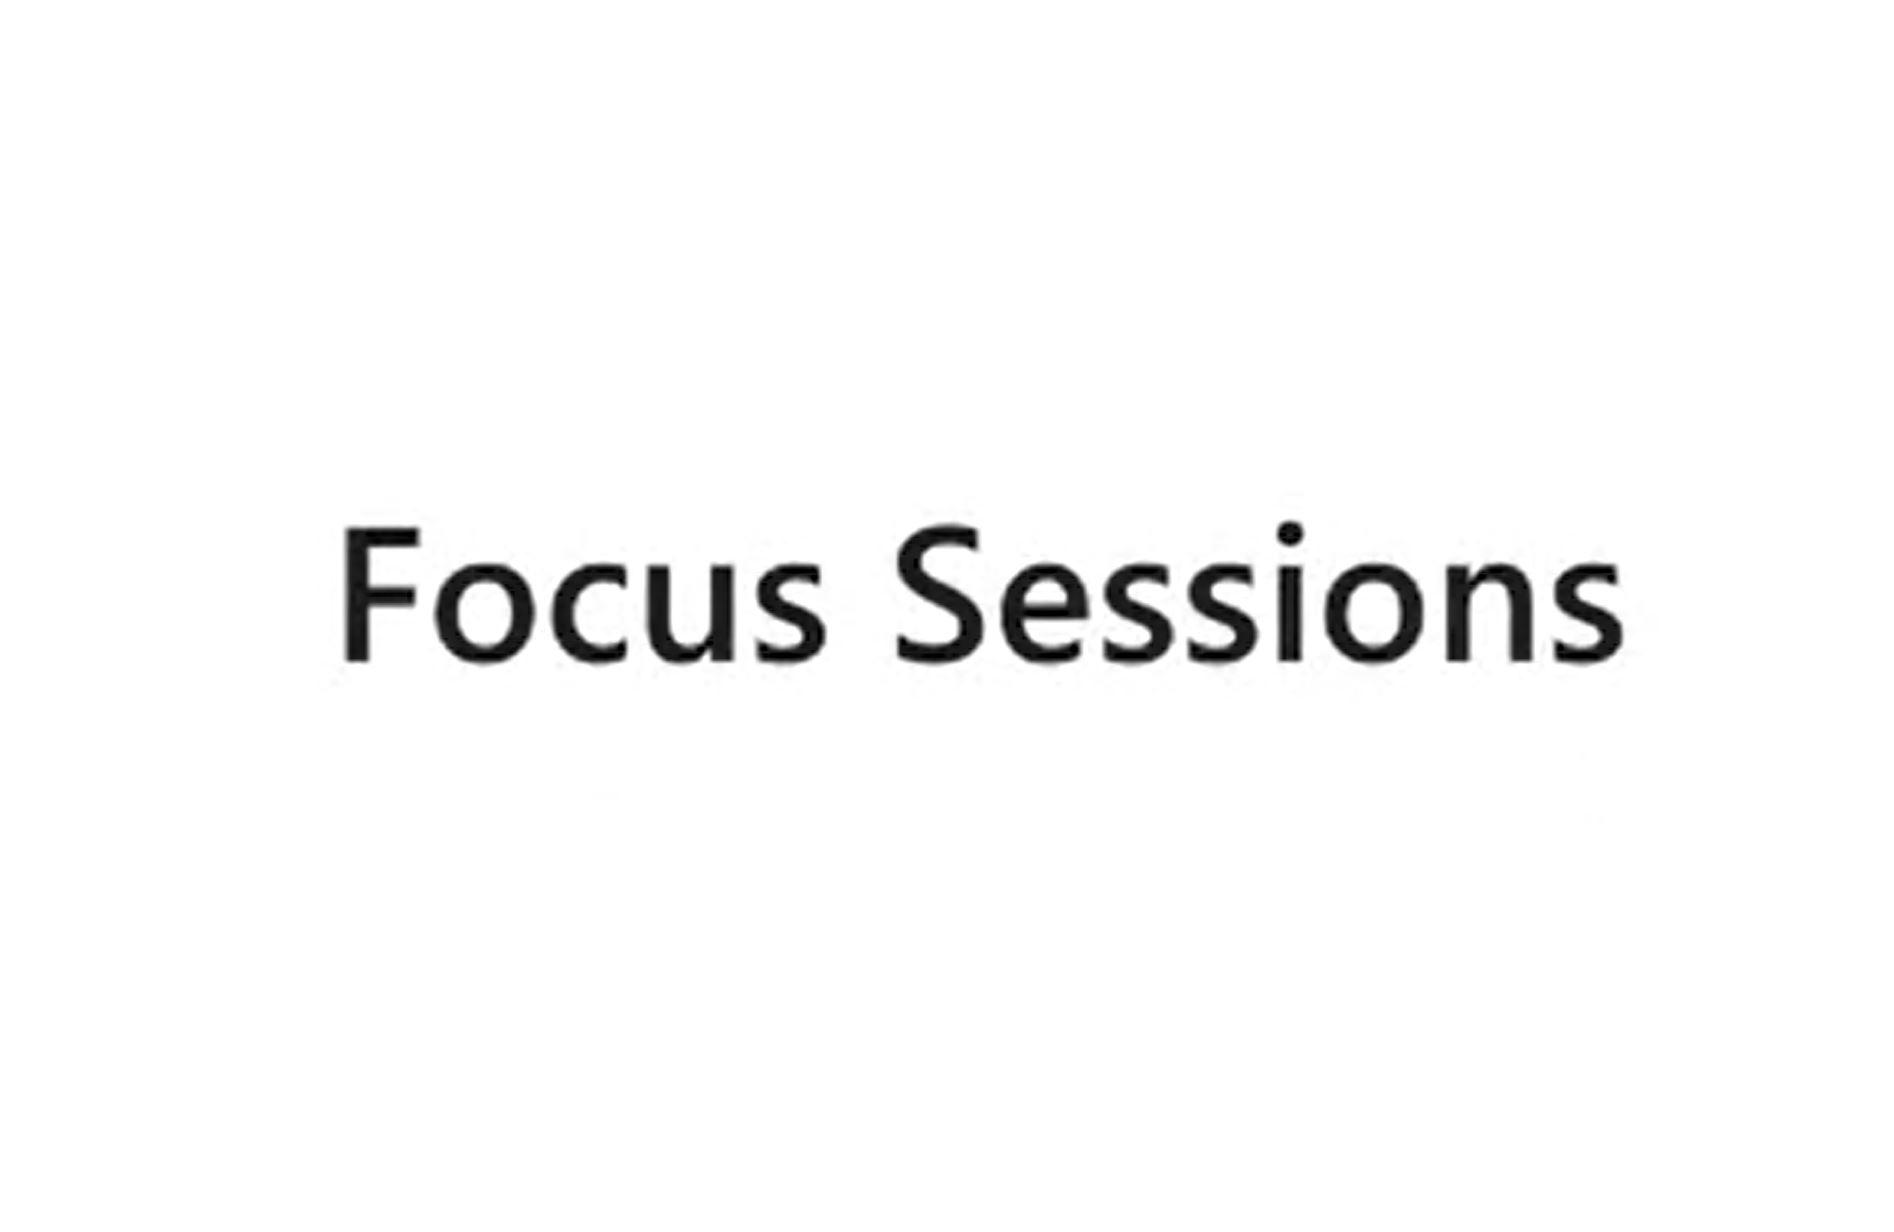 Microsoft Windows 11 Focus Sessions